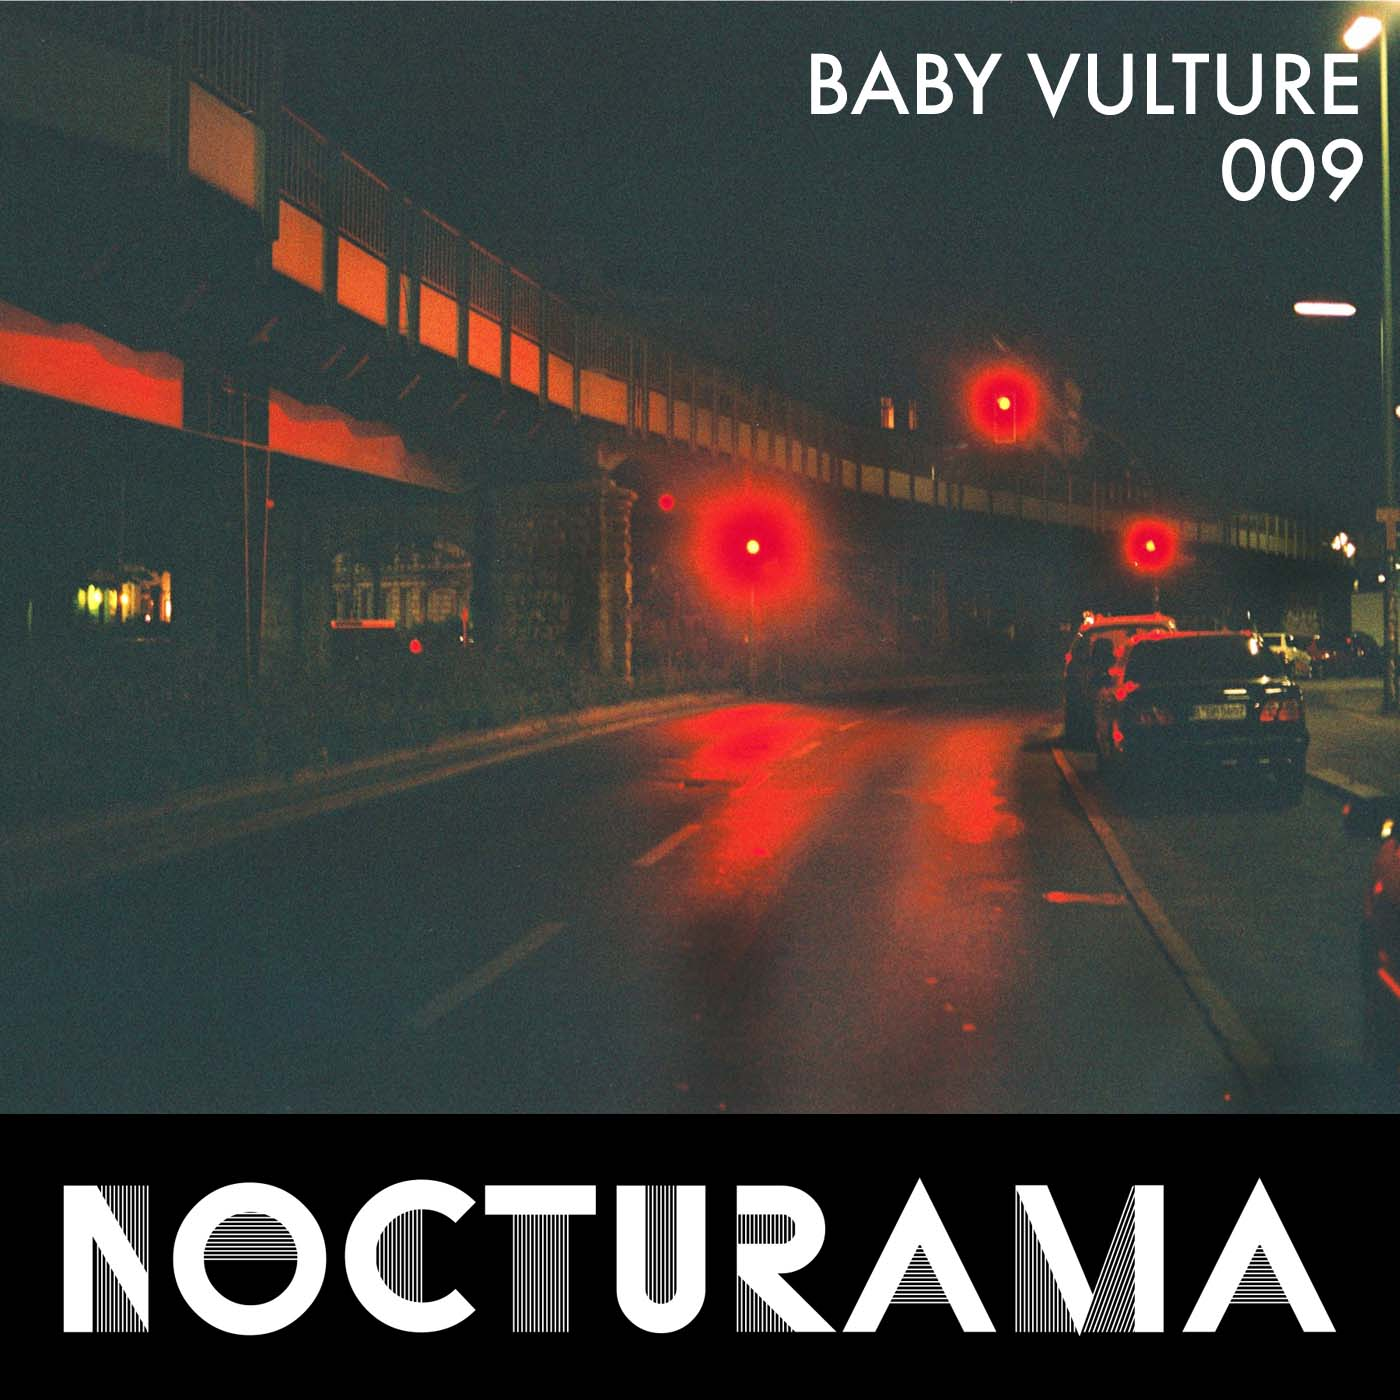 http://geist-agency.com/news-description/Nocturama009-Baby-Vulture